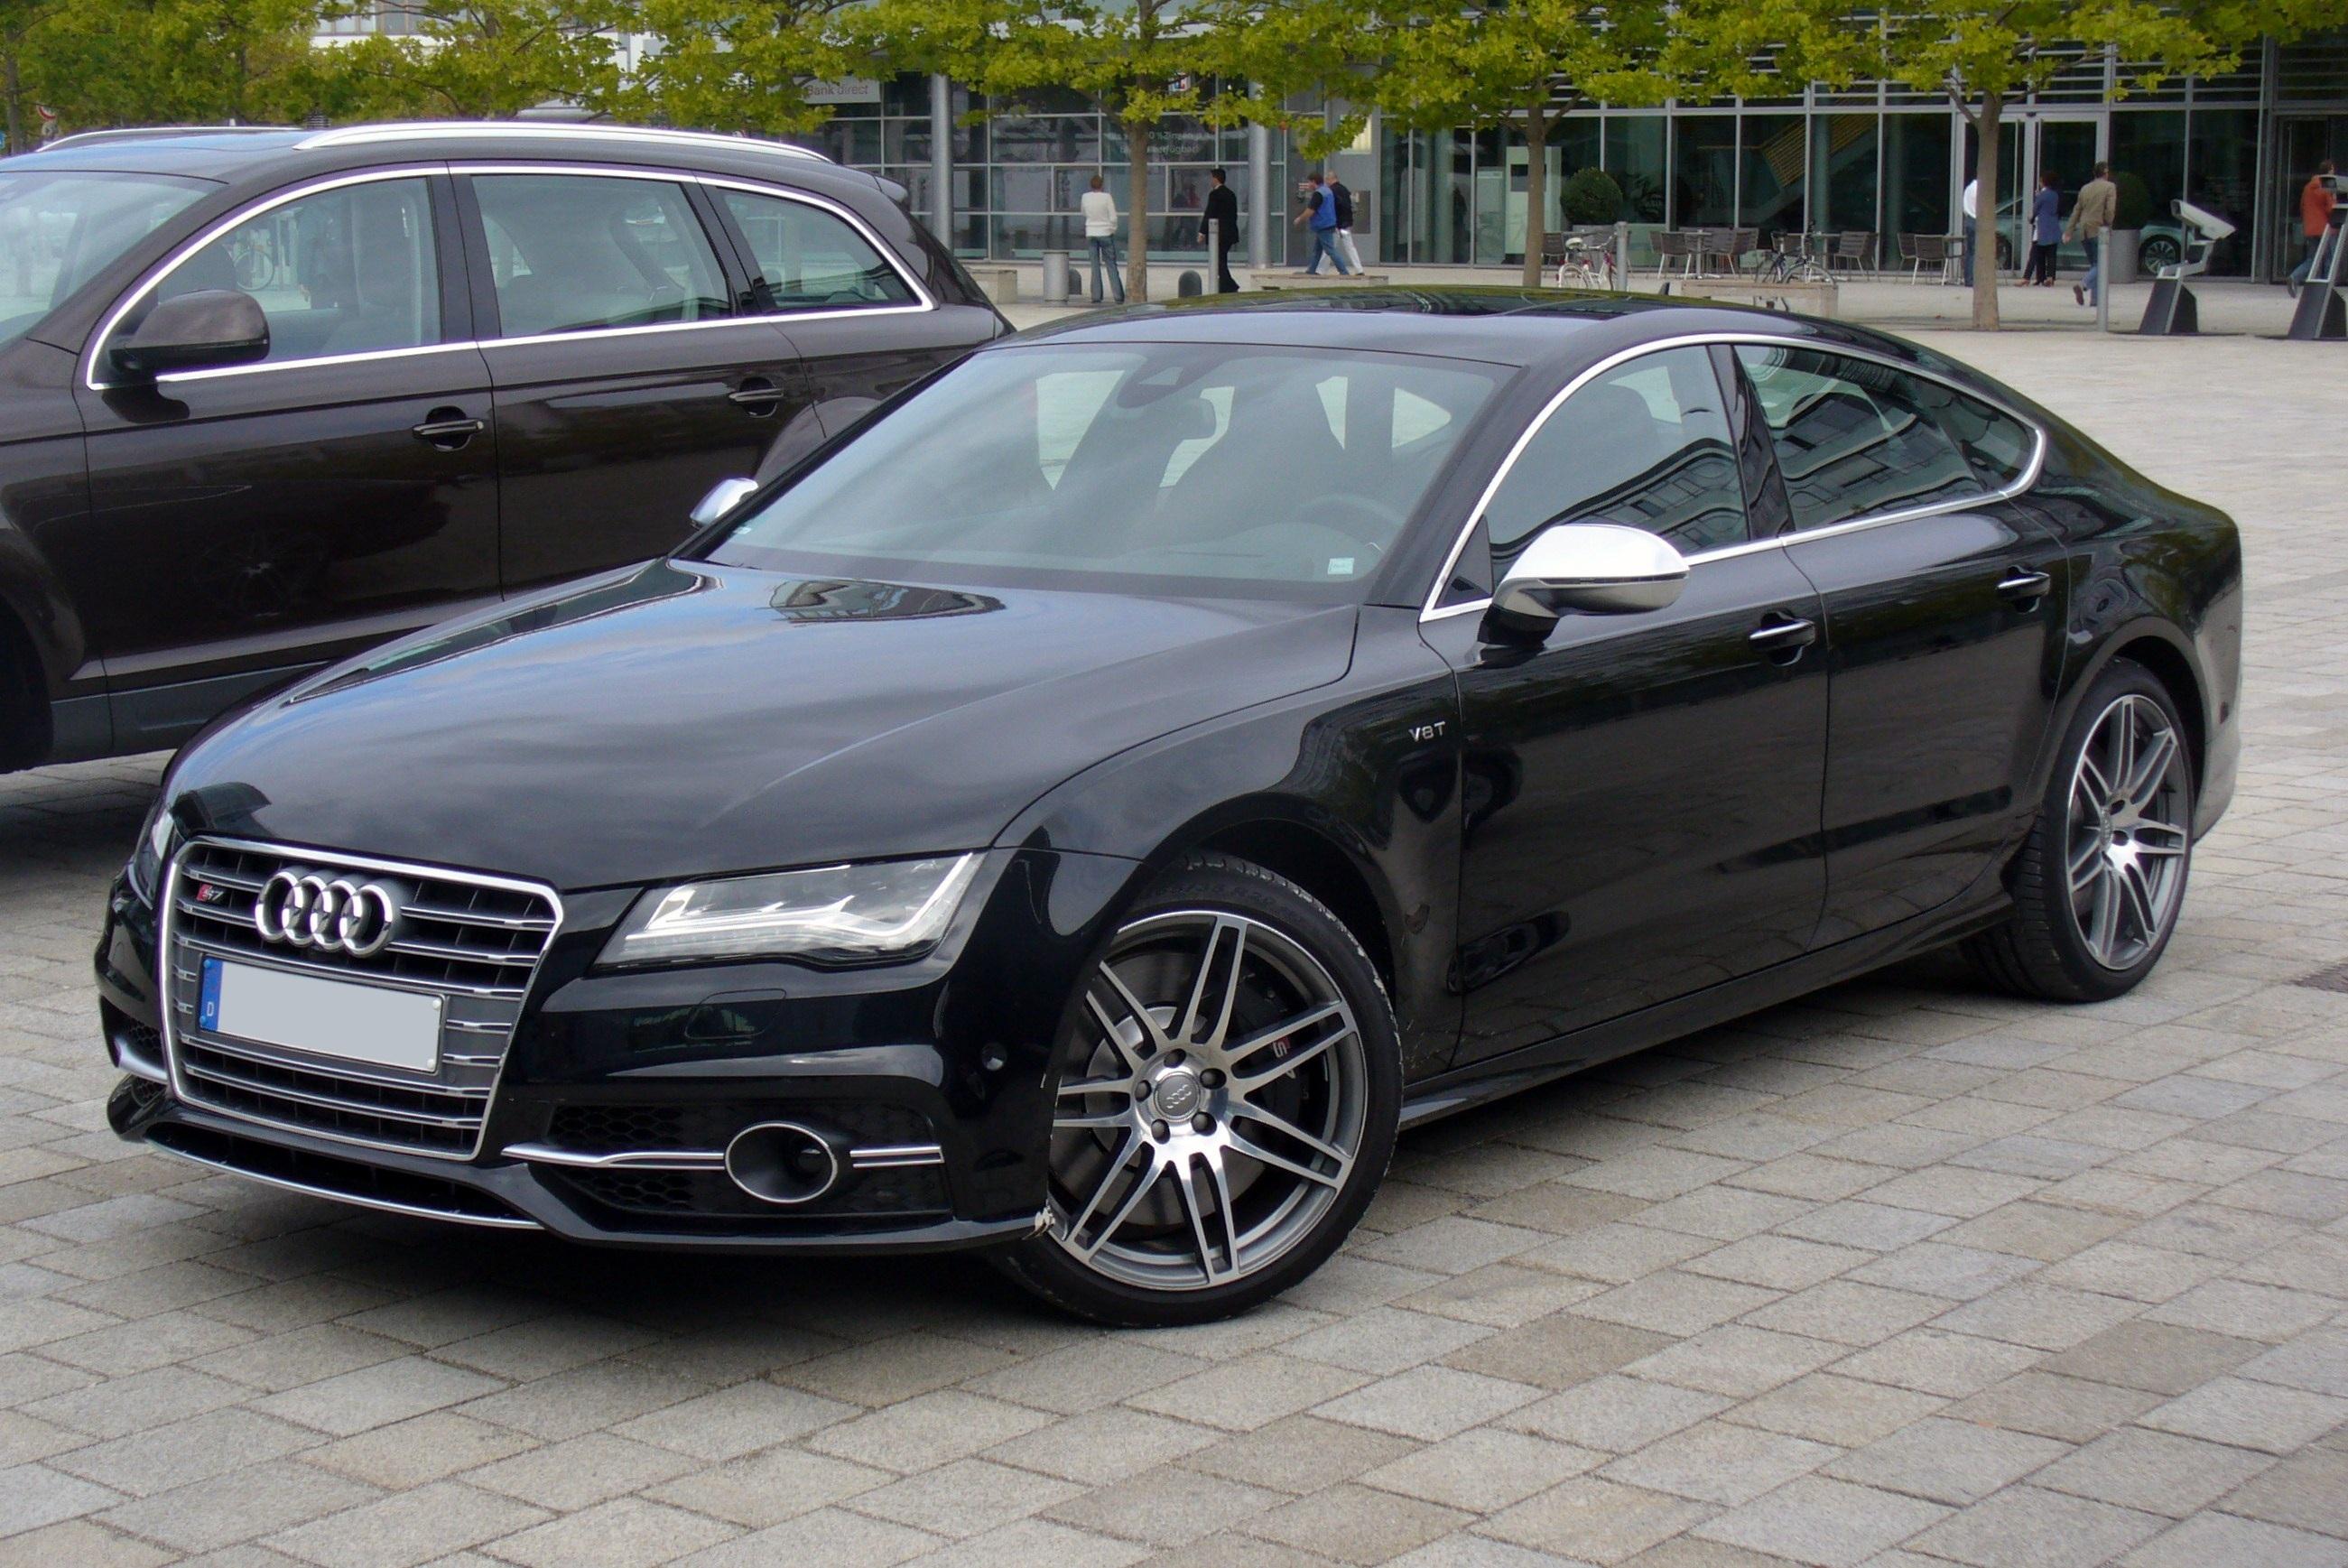 File:Audi S7 Sportback 4.0 TFSI quattro S tronic.JPG